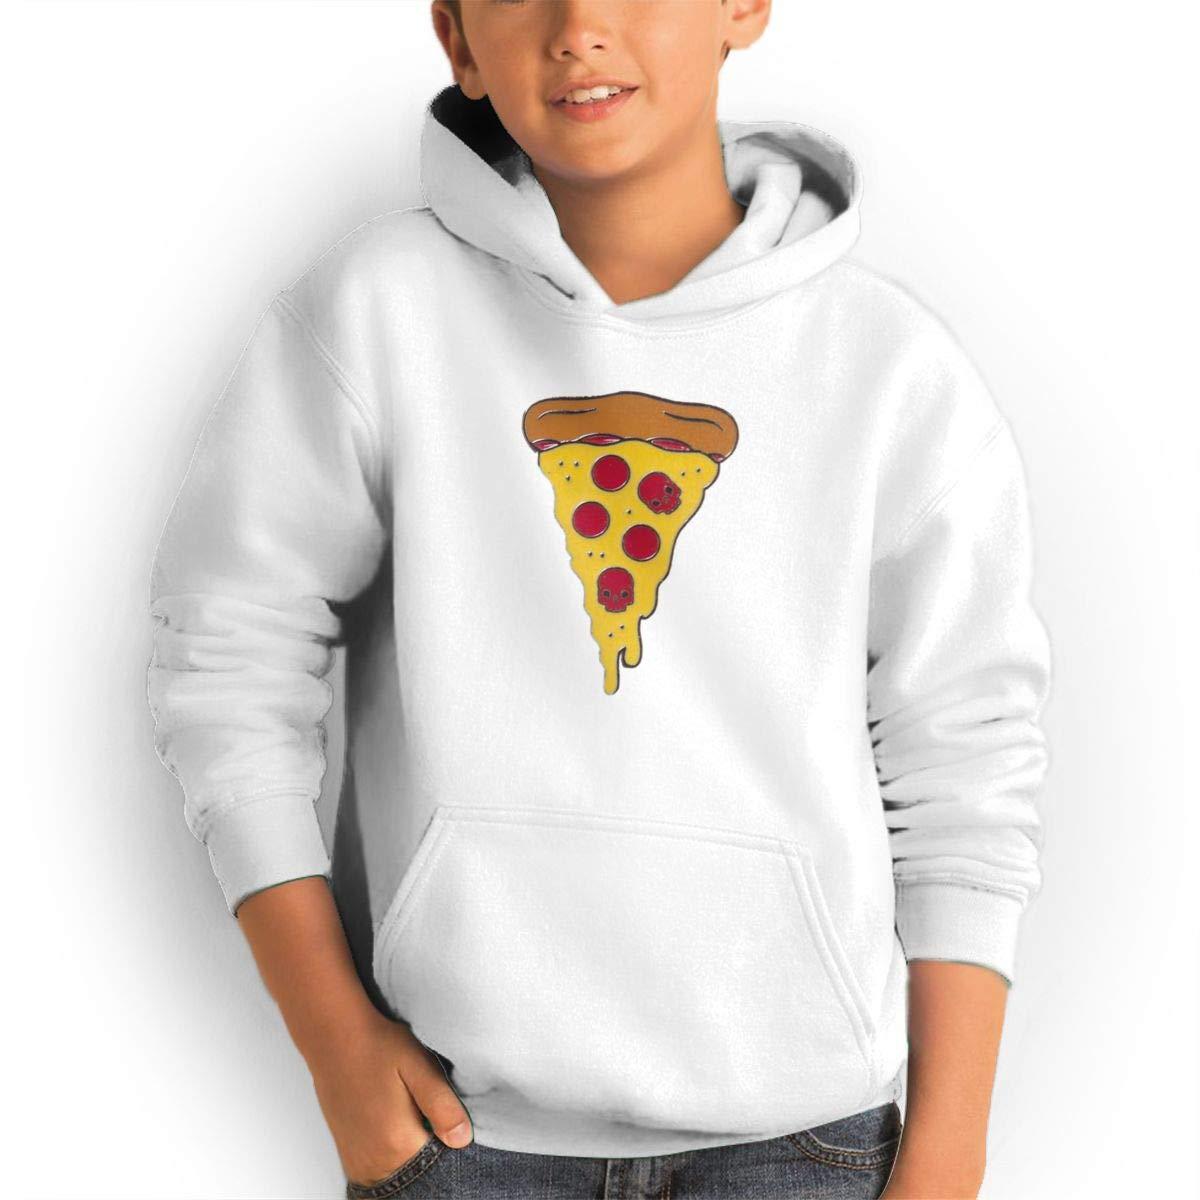 Pocket Pullover Hoodies Sweatshirt Honins Youth Leisure Sports Pizza